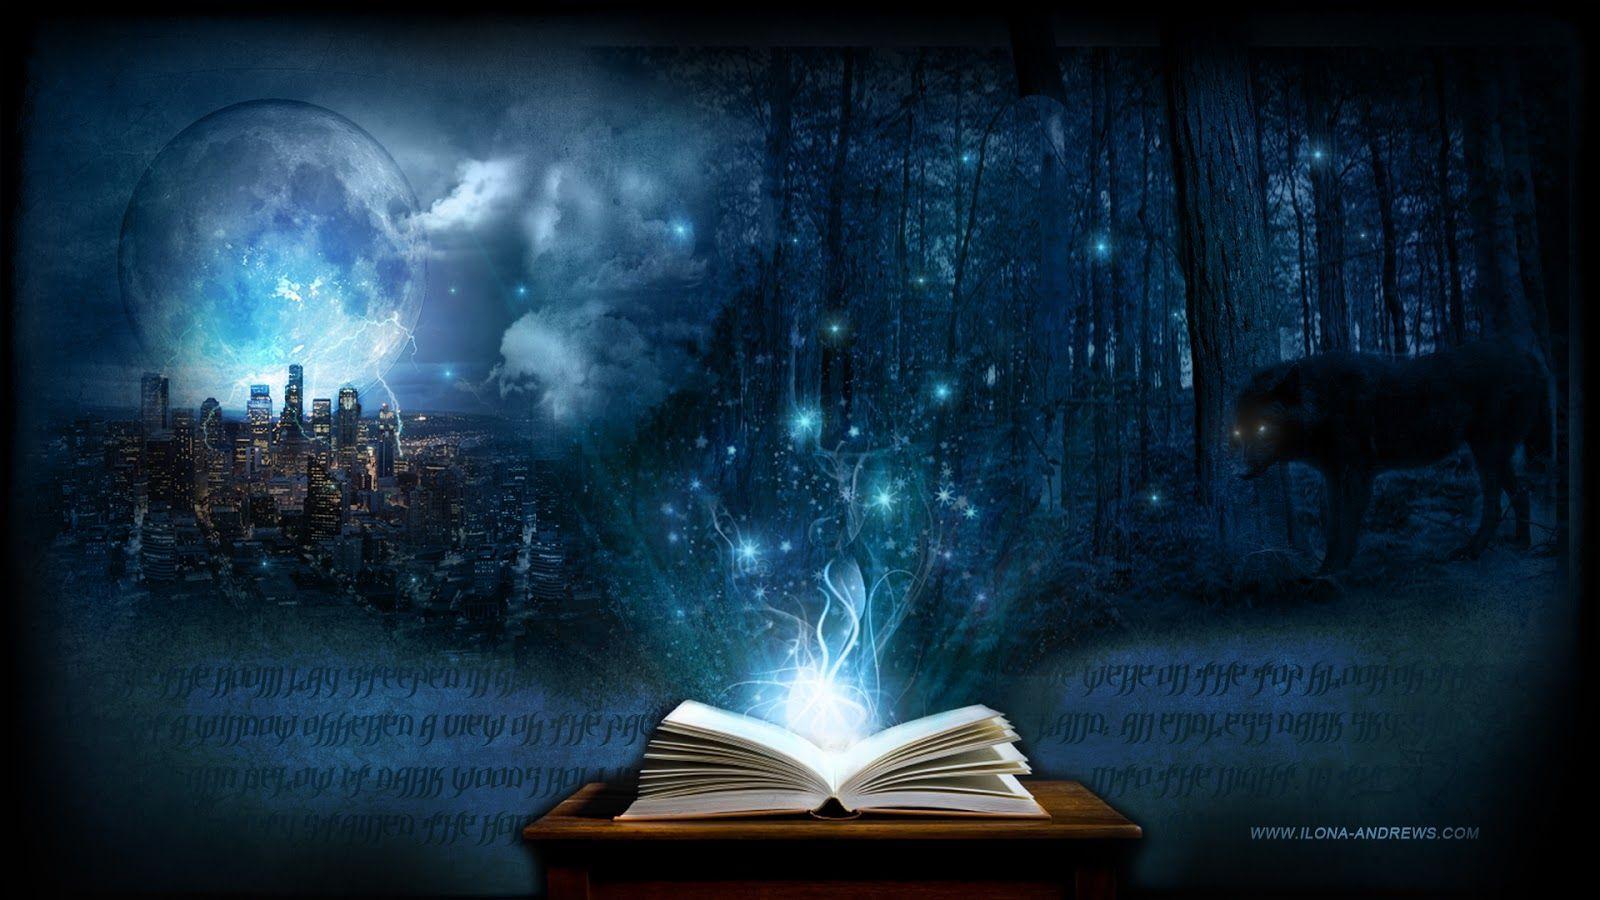 Magic Book 2290410 Hd Wallpaper Backgrounds Download